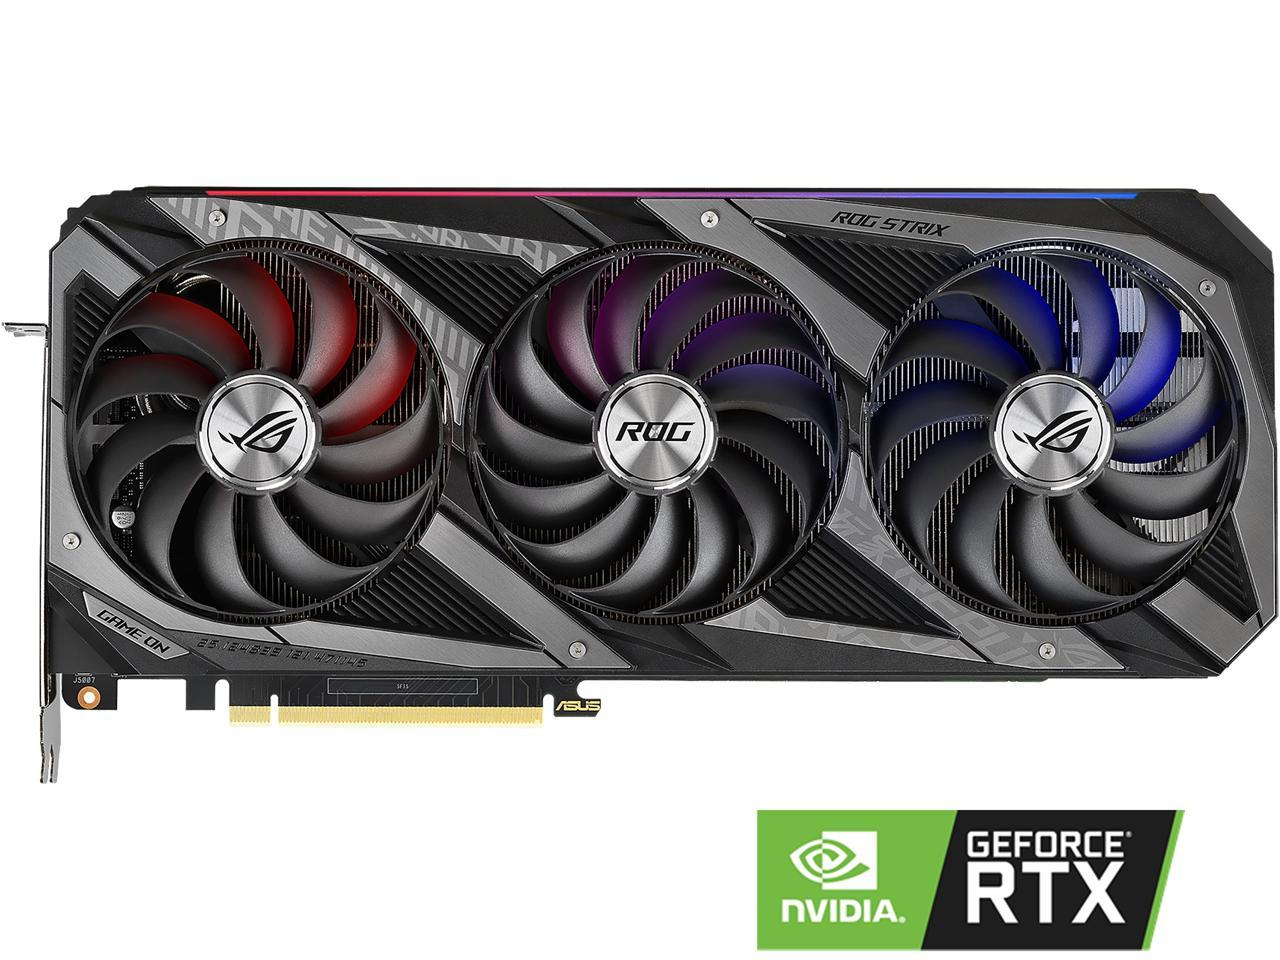 VGA ASUS ROG Strix GeForce RTX 3060 12GB GDDR6 کارت گرافیک ایسوس